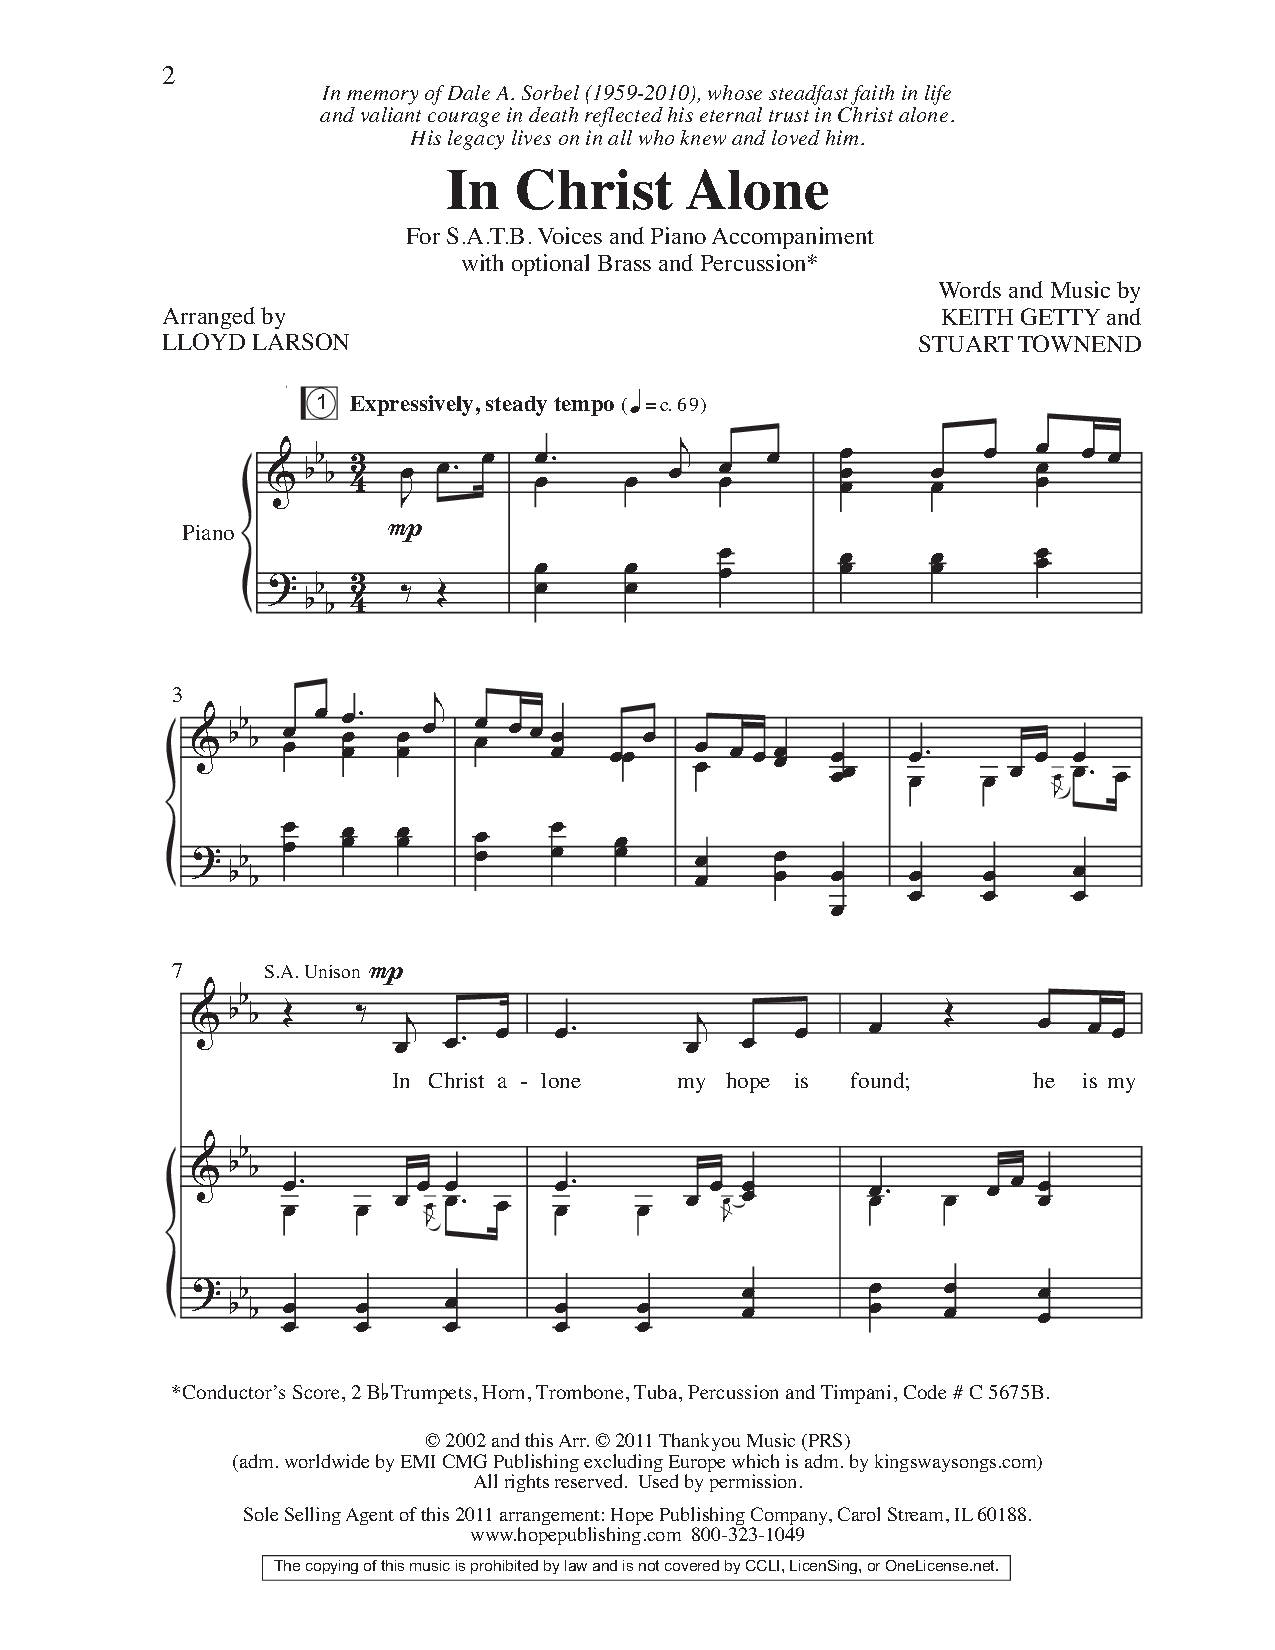 In Christ Alone (SATB ) by Keith Getty & Stu | J.W. Pepper Sheet Music | In christ alone. Choir music. Choral sheet music